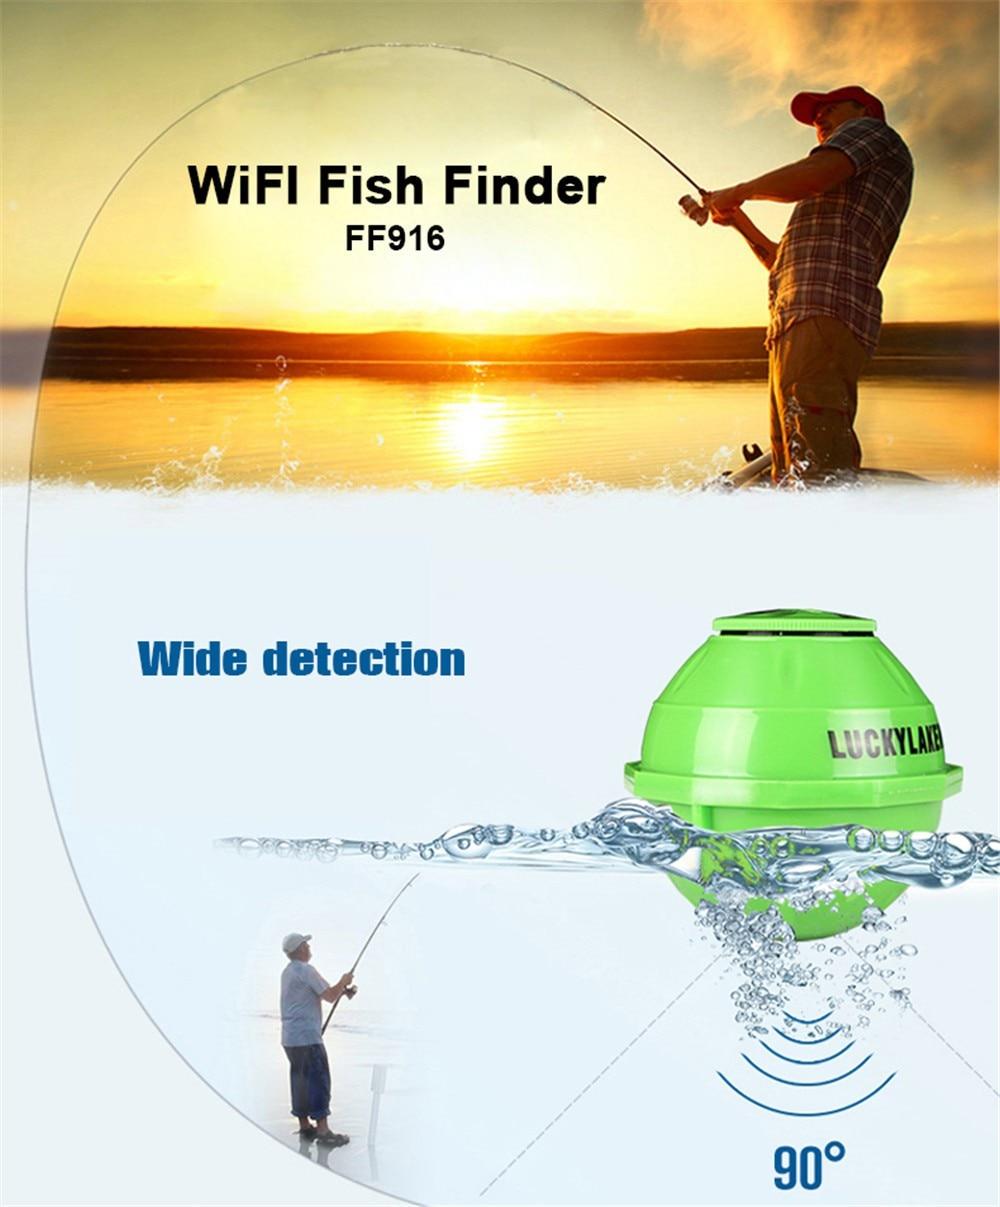 Localizadores de peixe